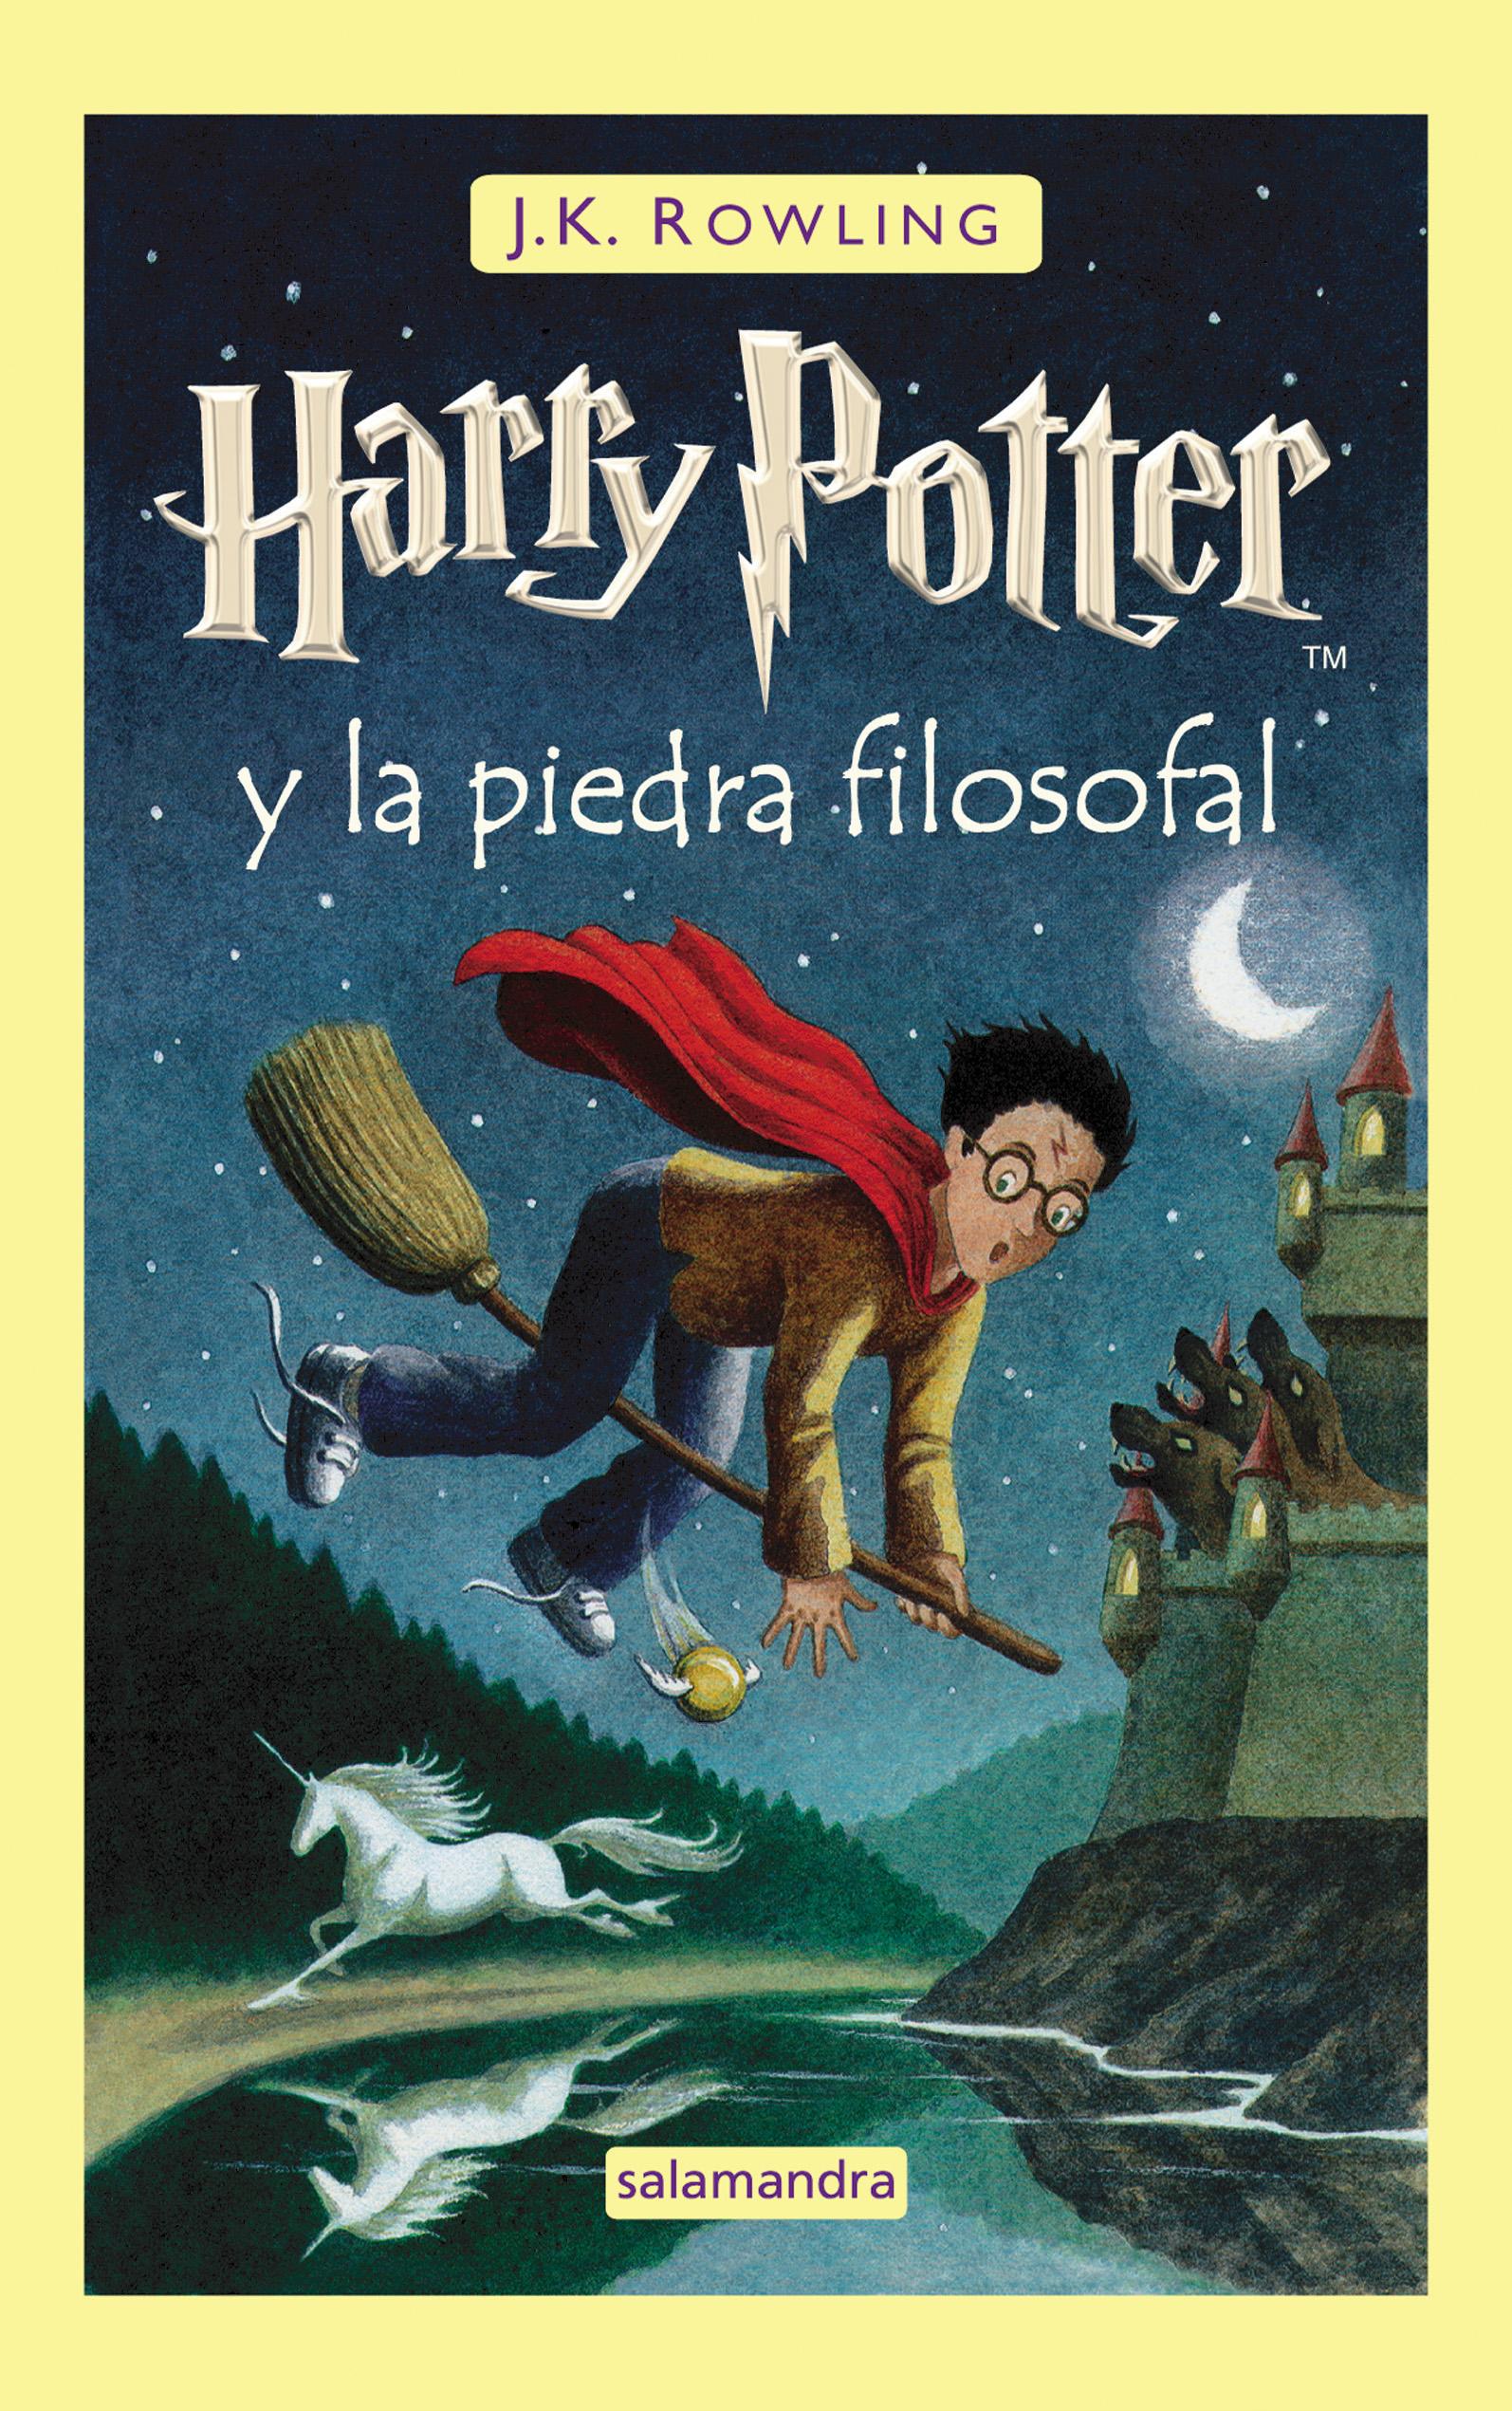 http://img2.wikia.nocookie.net/__cb20110816014904/es.harrypotter/images/9/9a/Harry_Potter_y_la_Piedra_Filosofal_Portada_Espa%C3%B1ol.PNG